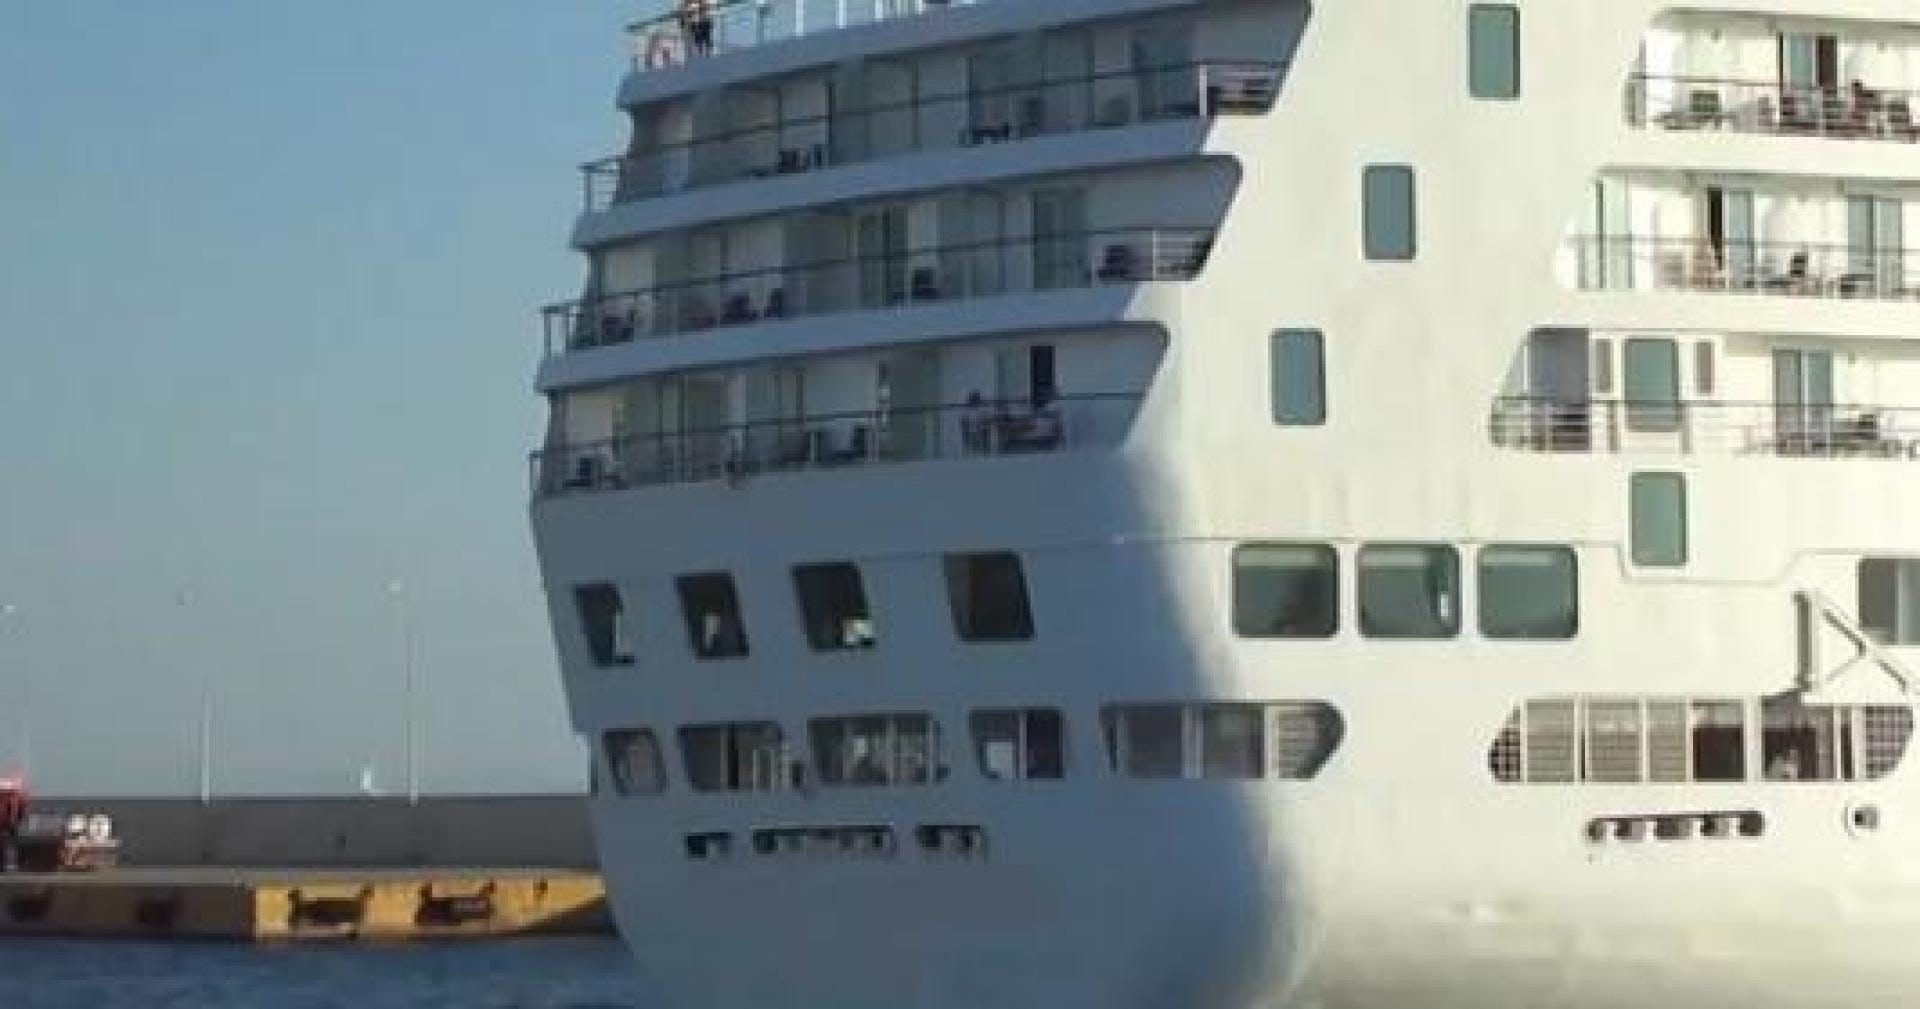 1990 Custom 579' ISHIKAWAJIMA Cruise Ship Aegean Paradise | Picture 4 of 14